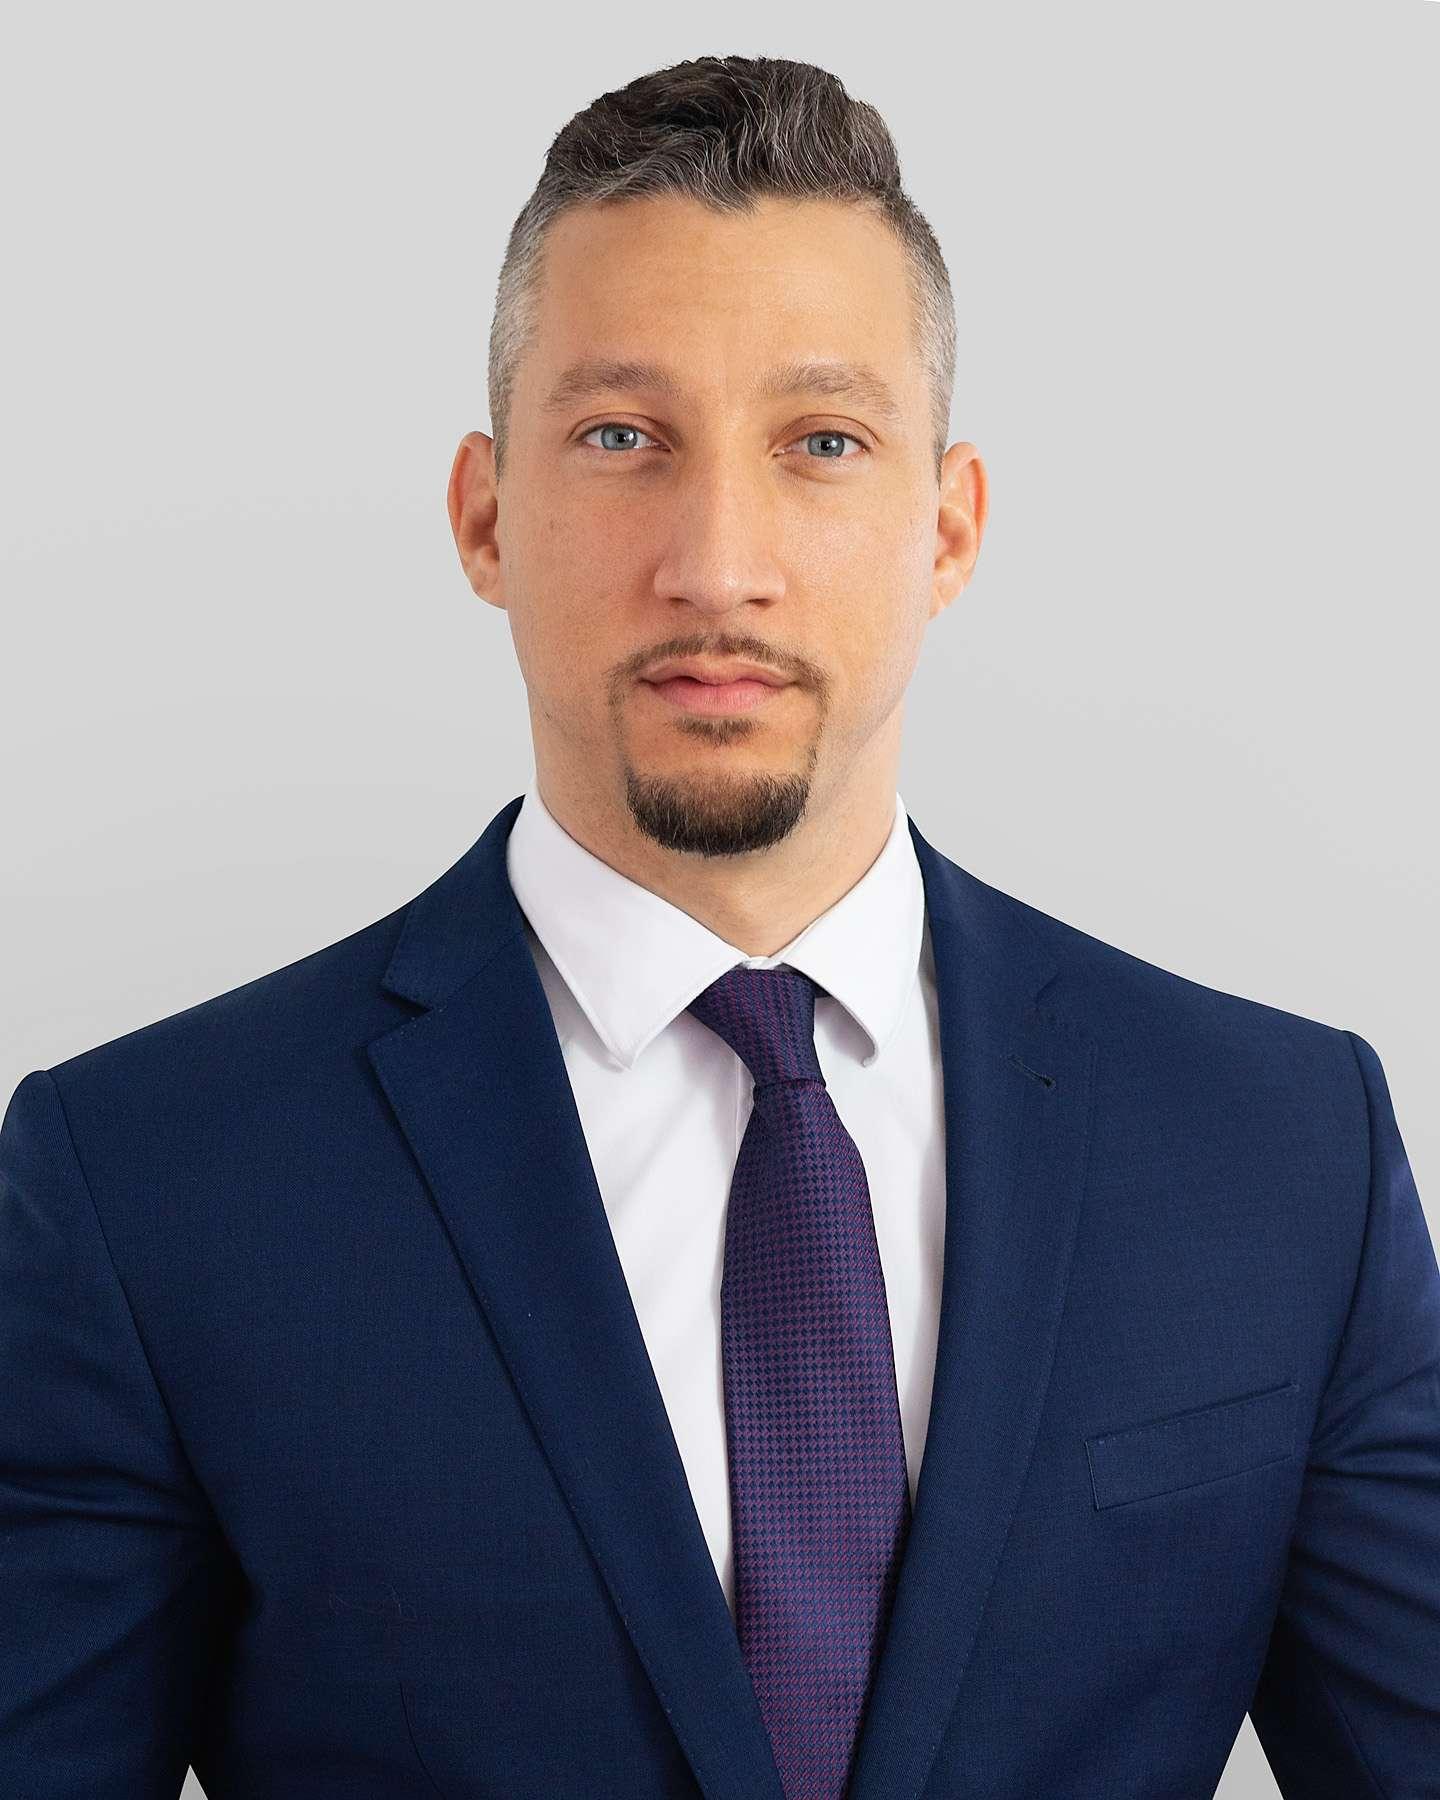 Sarasota Criminal Defense Attorney